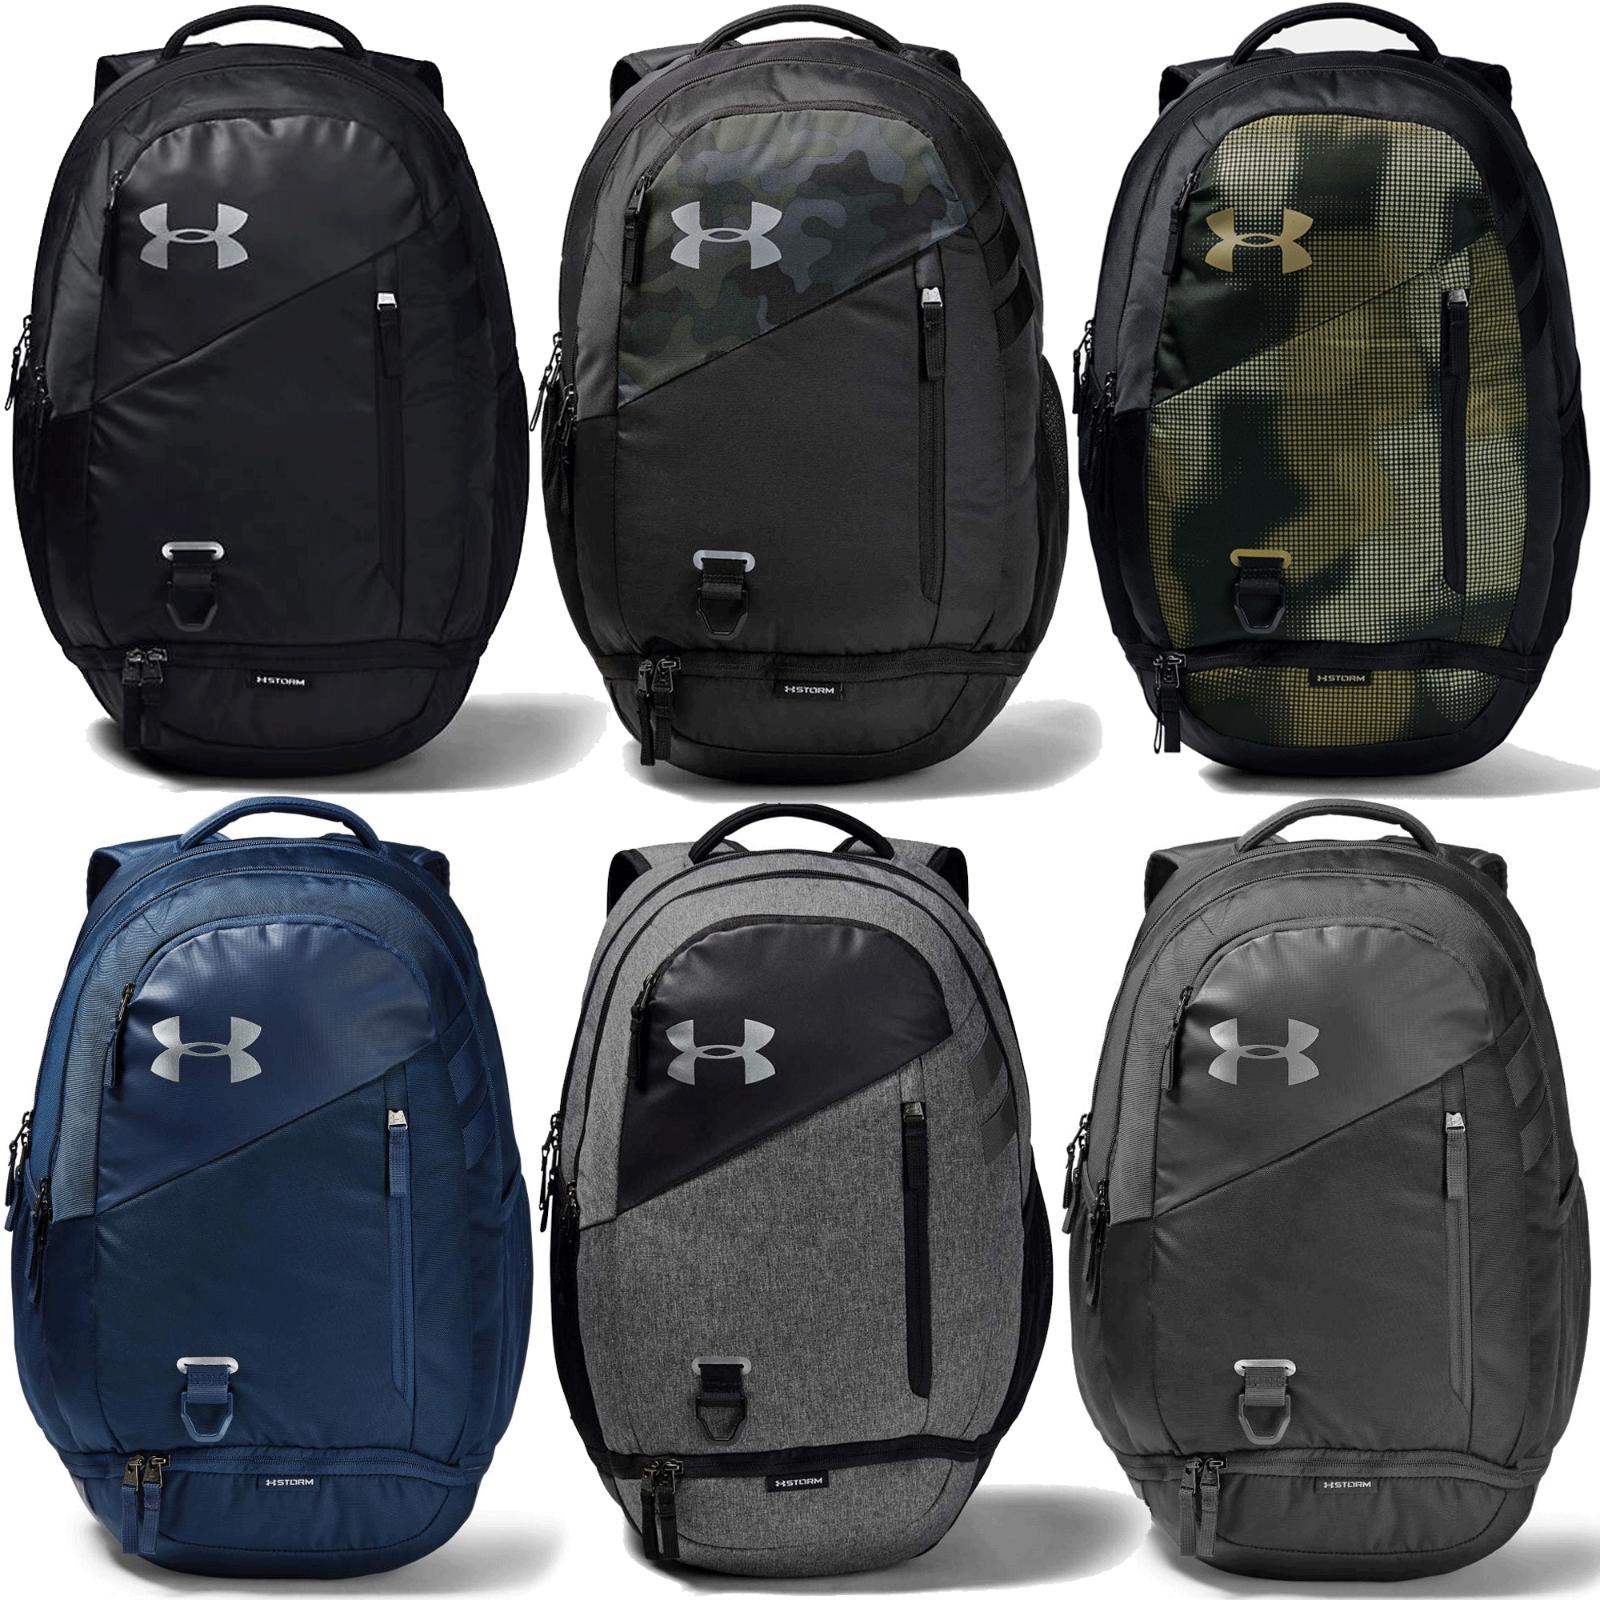 Under Armour 2019 new  Backpack Rucksack Gym Training School Travel Bag